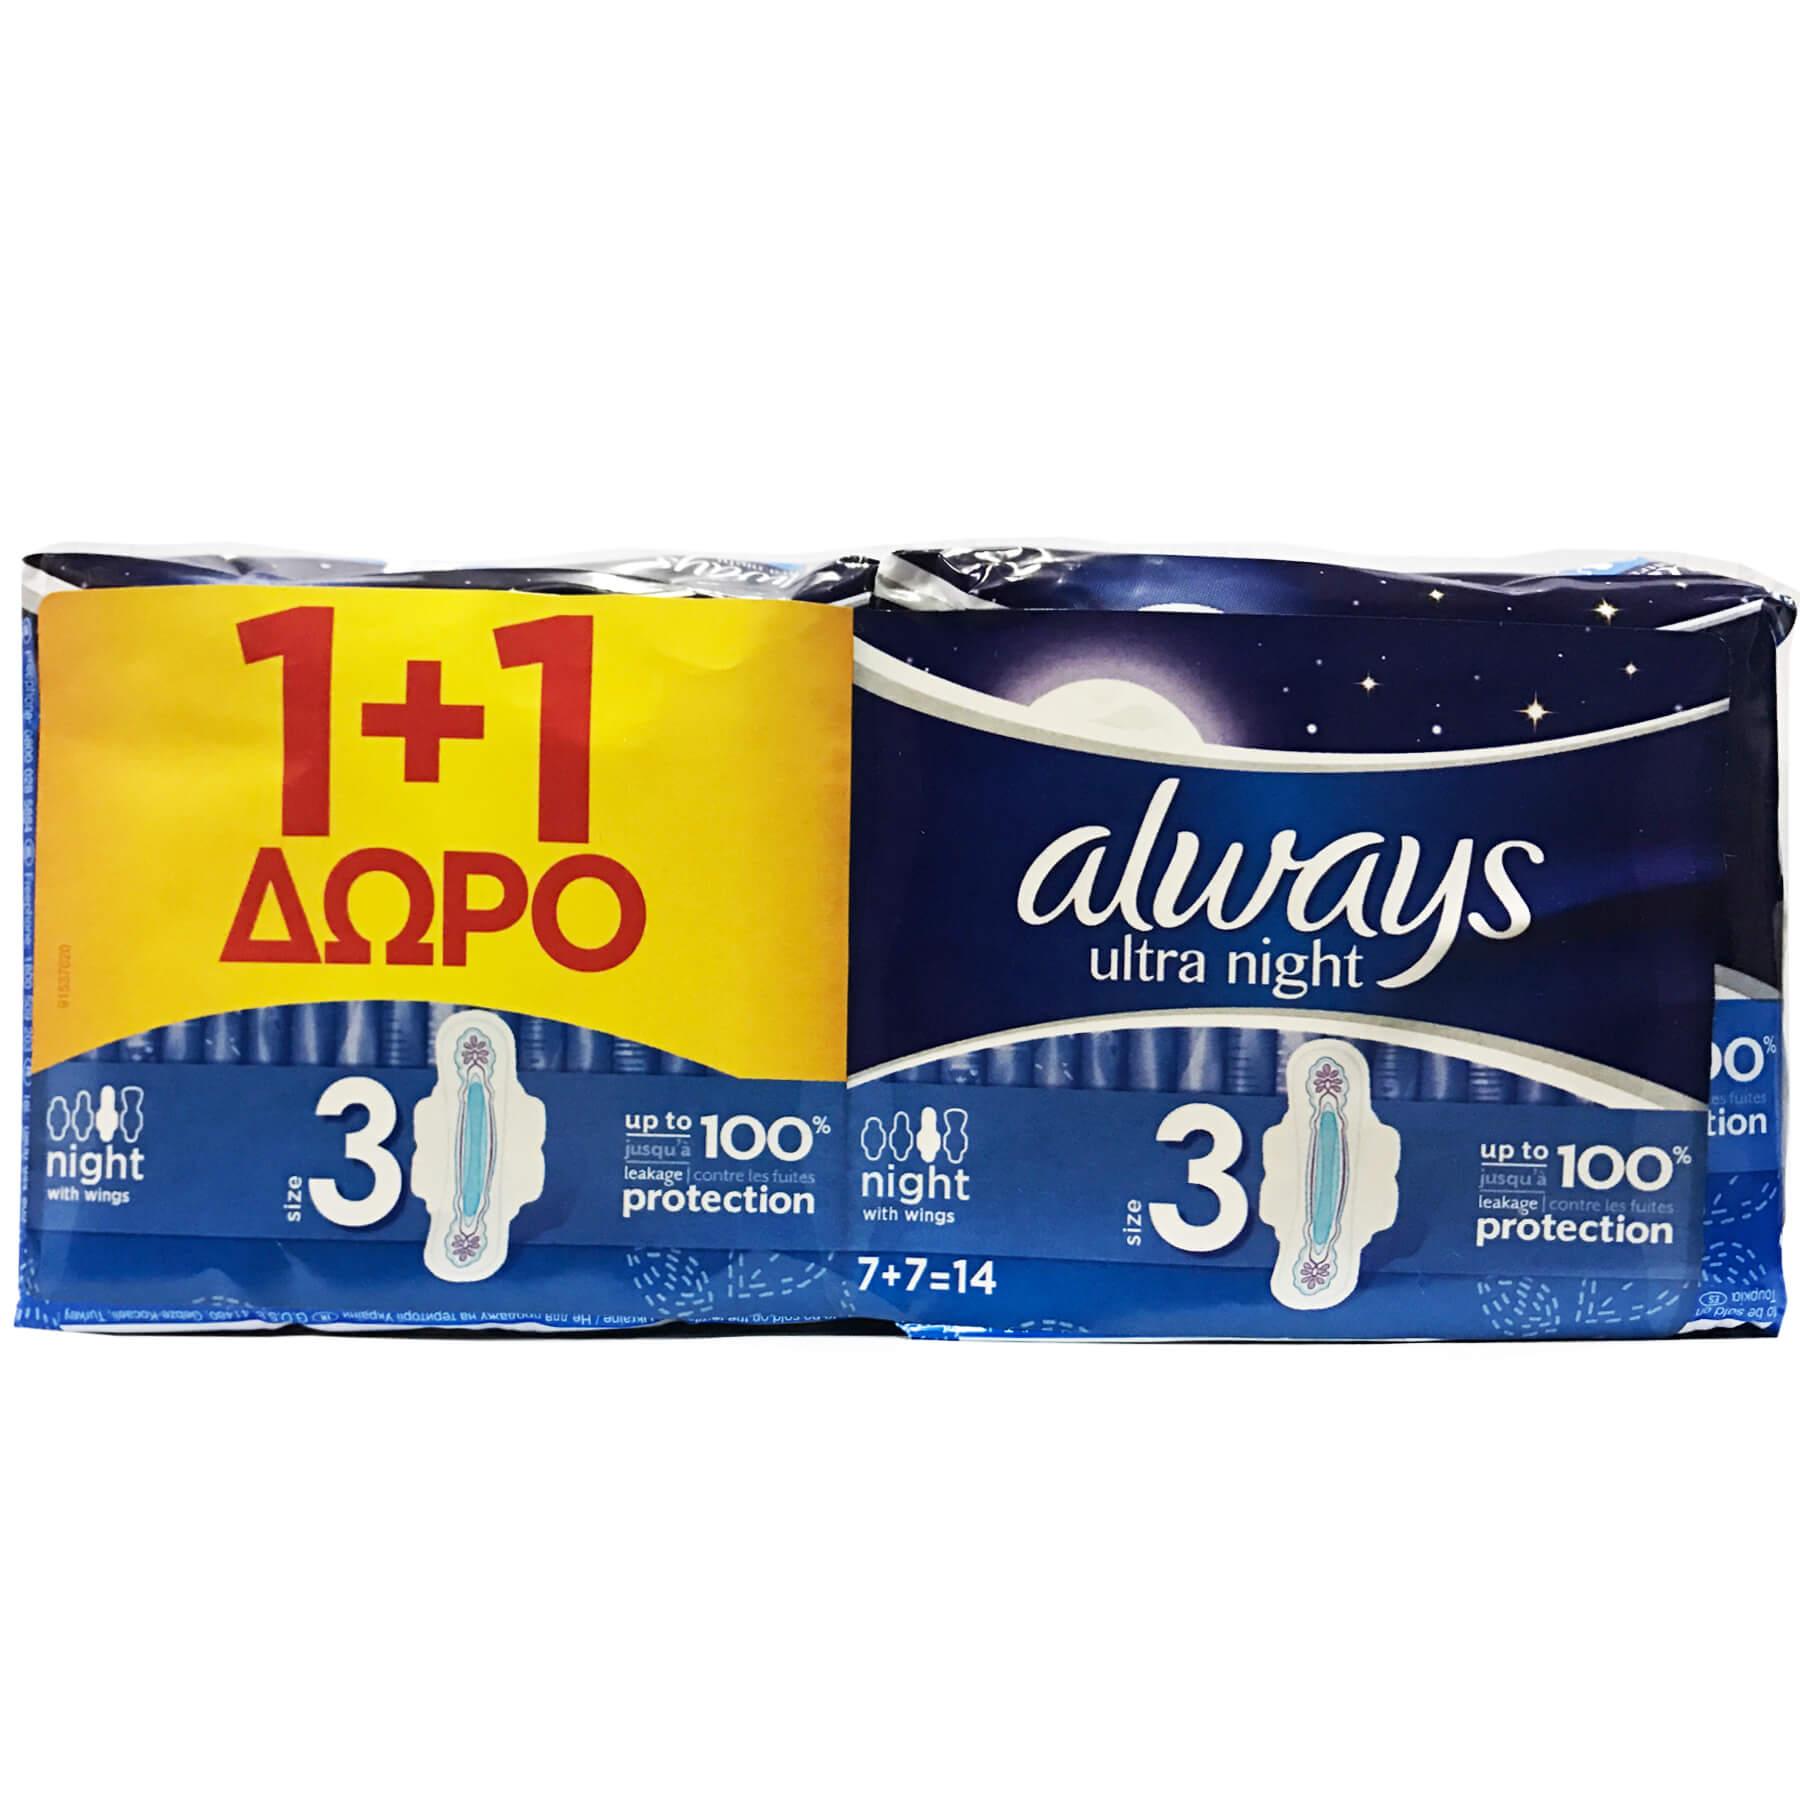 Always Πακέτο Προσφοράς Ultra Night Size 3 Σερβιέτες με Φτερά 2×7Τεμάχια 1+1 Δώρο